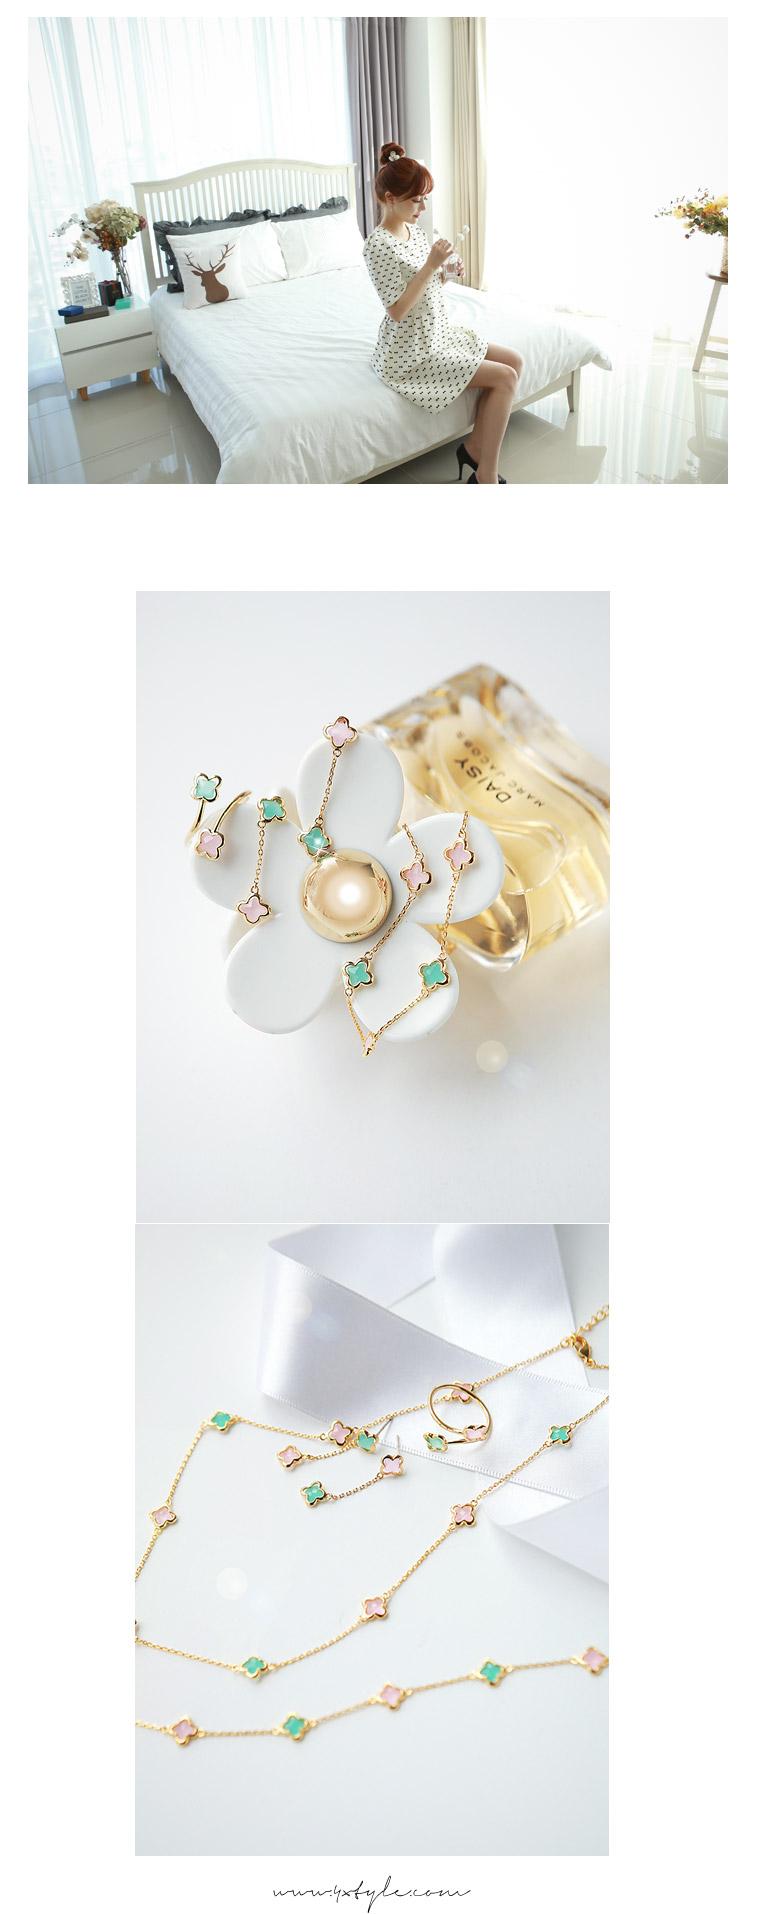 [ 4xtyle ] 妇女柔和的花环,一种颜色